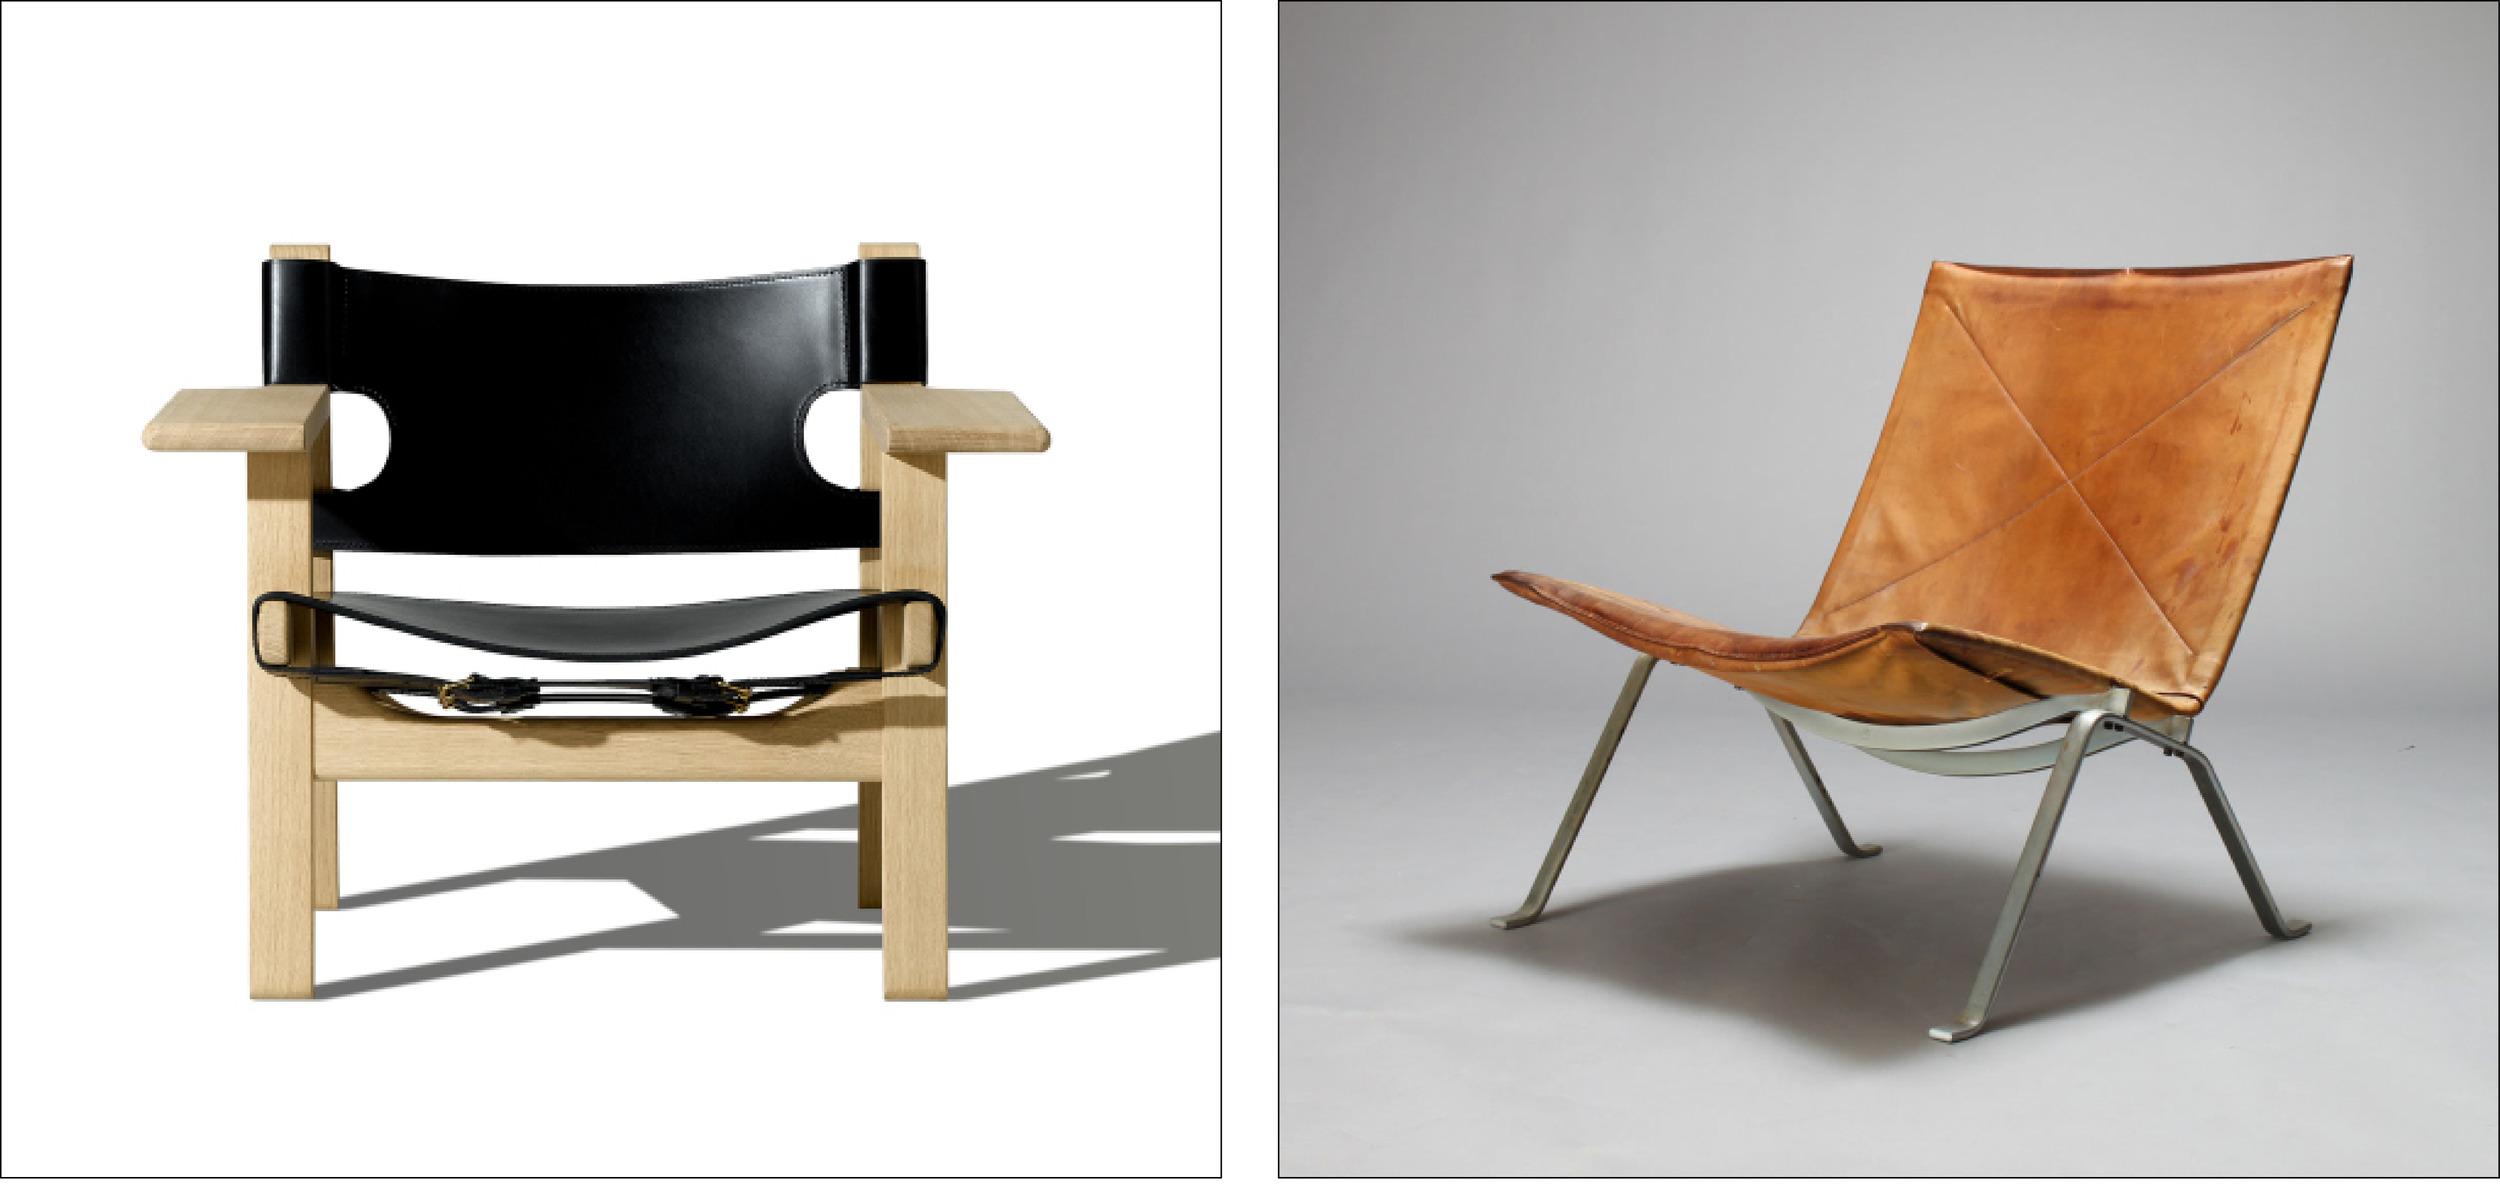 Spanish Chair byBørgeMogensen designed in 1958          PK 22 by PoulKjærholmdesigned in 1956